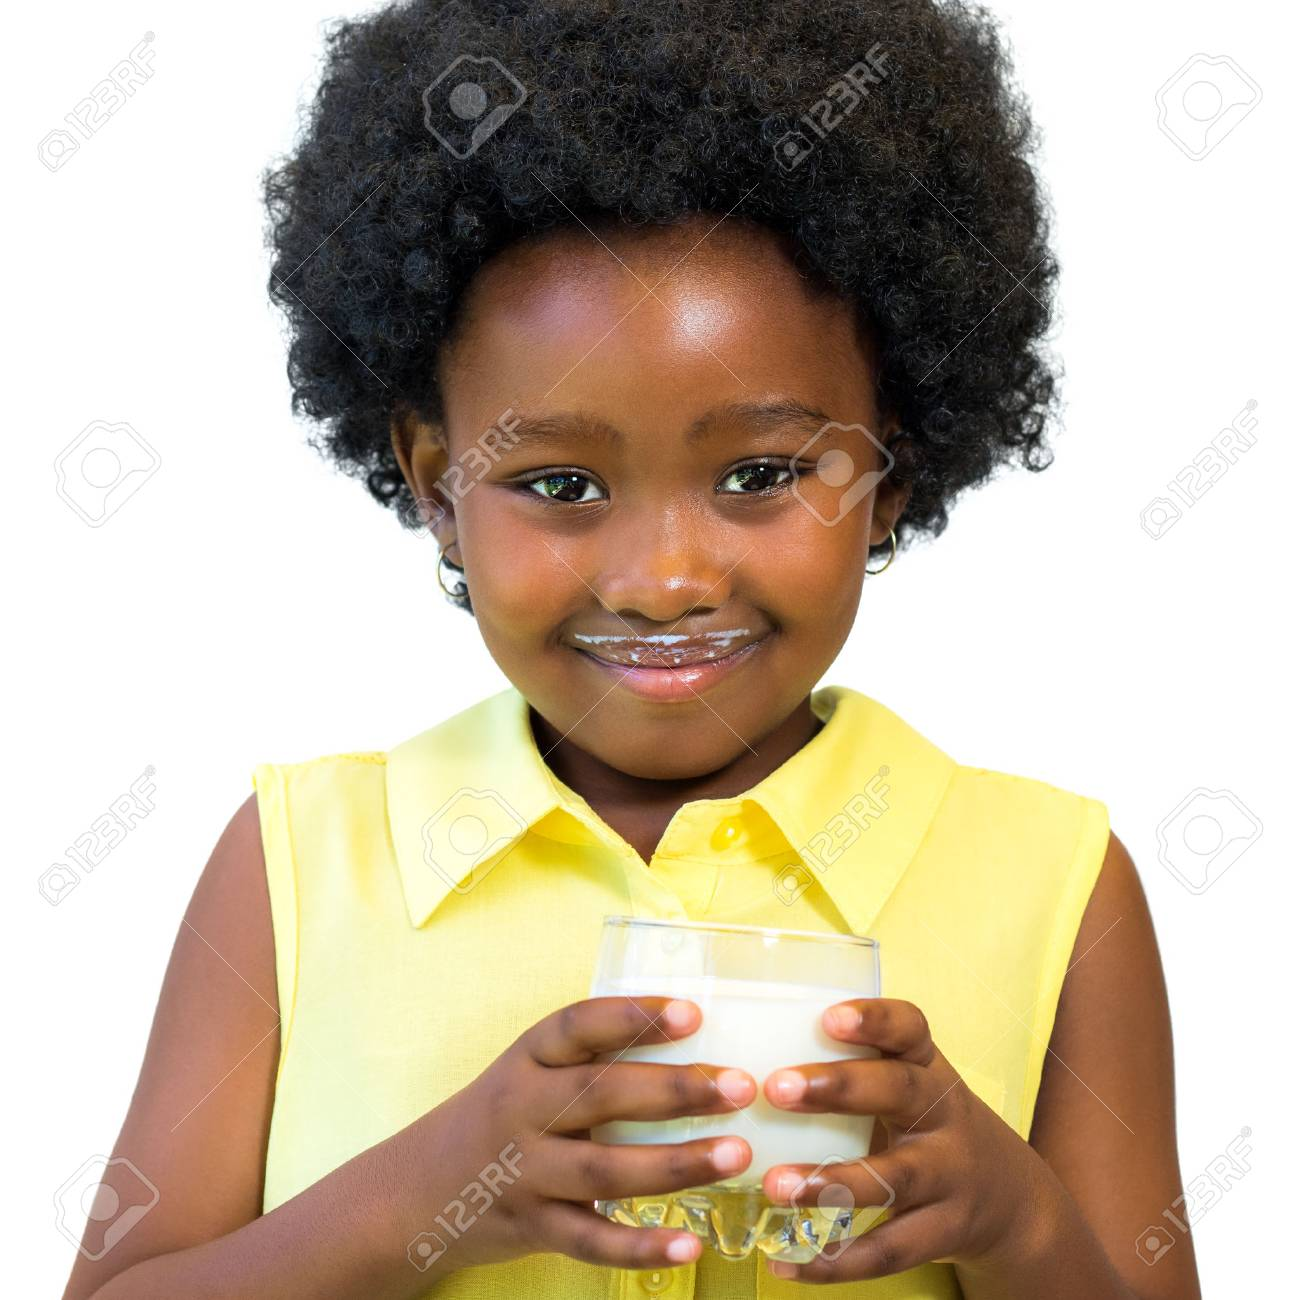 Afro girls with Black Celeb